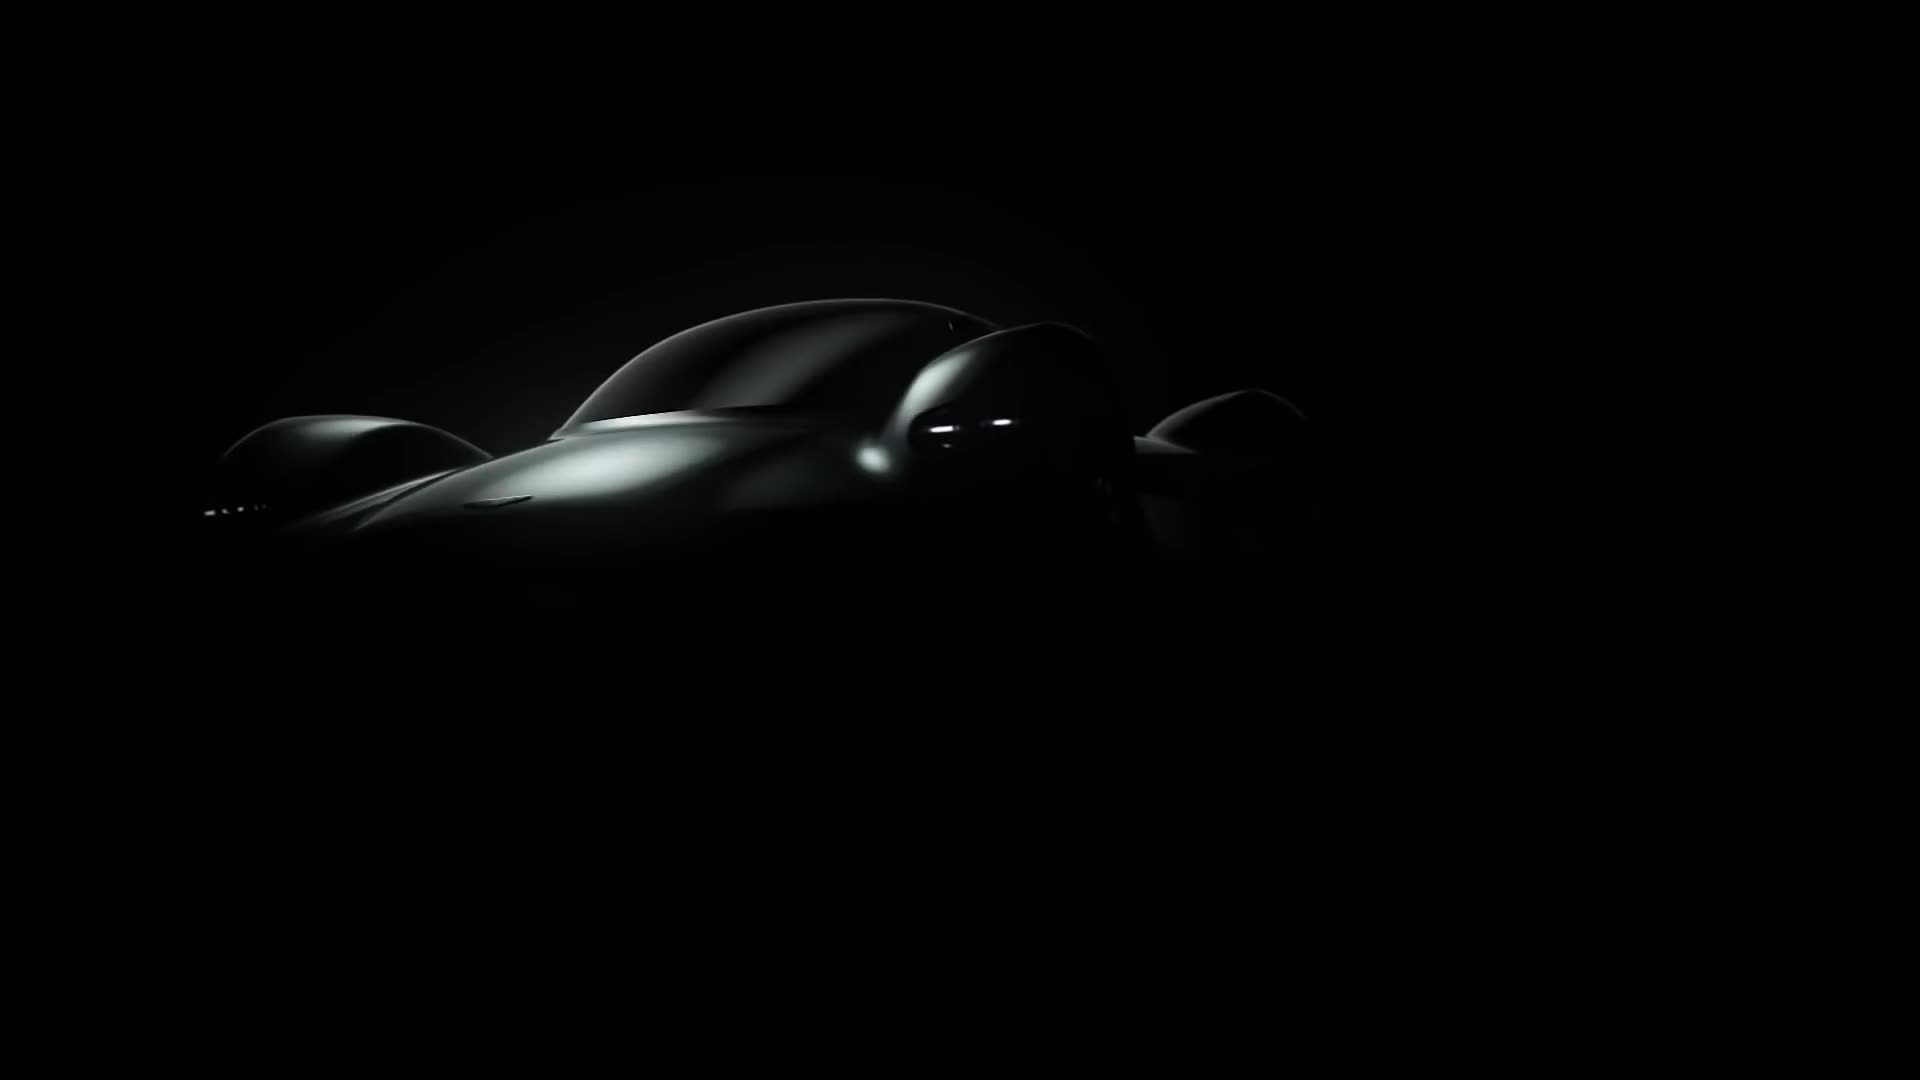 To V12 Ths Aston Martin Valkyrie